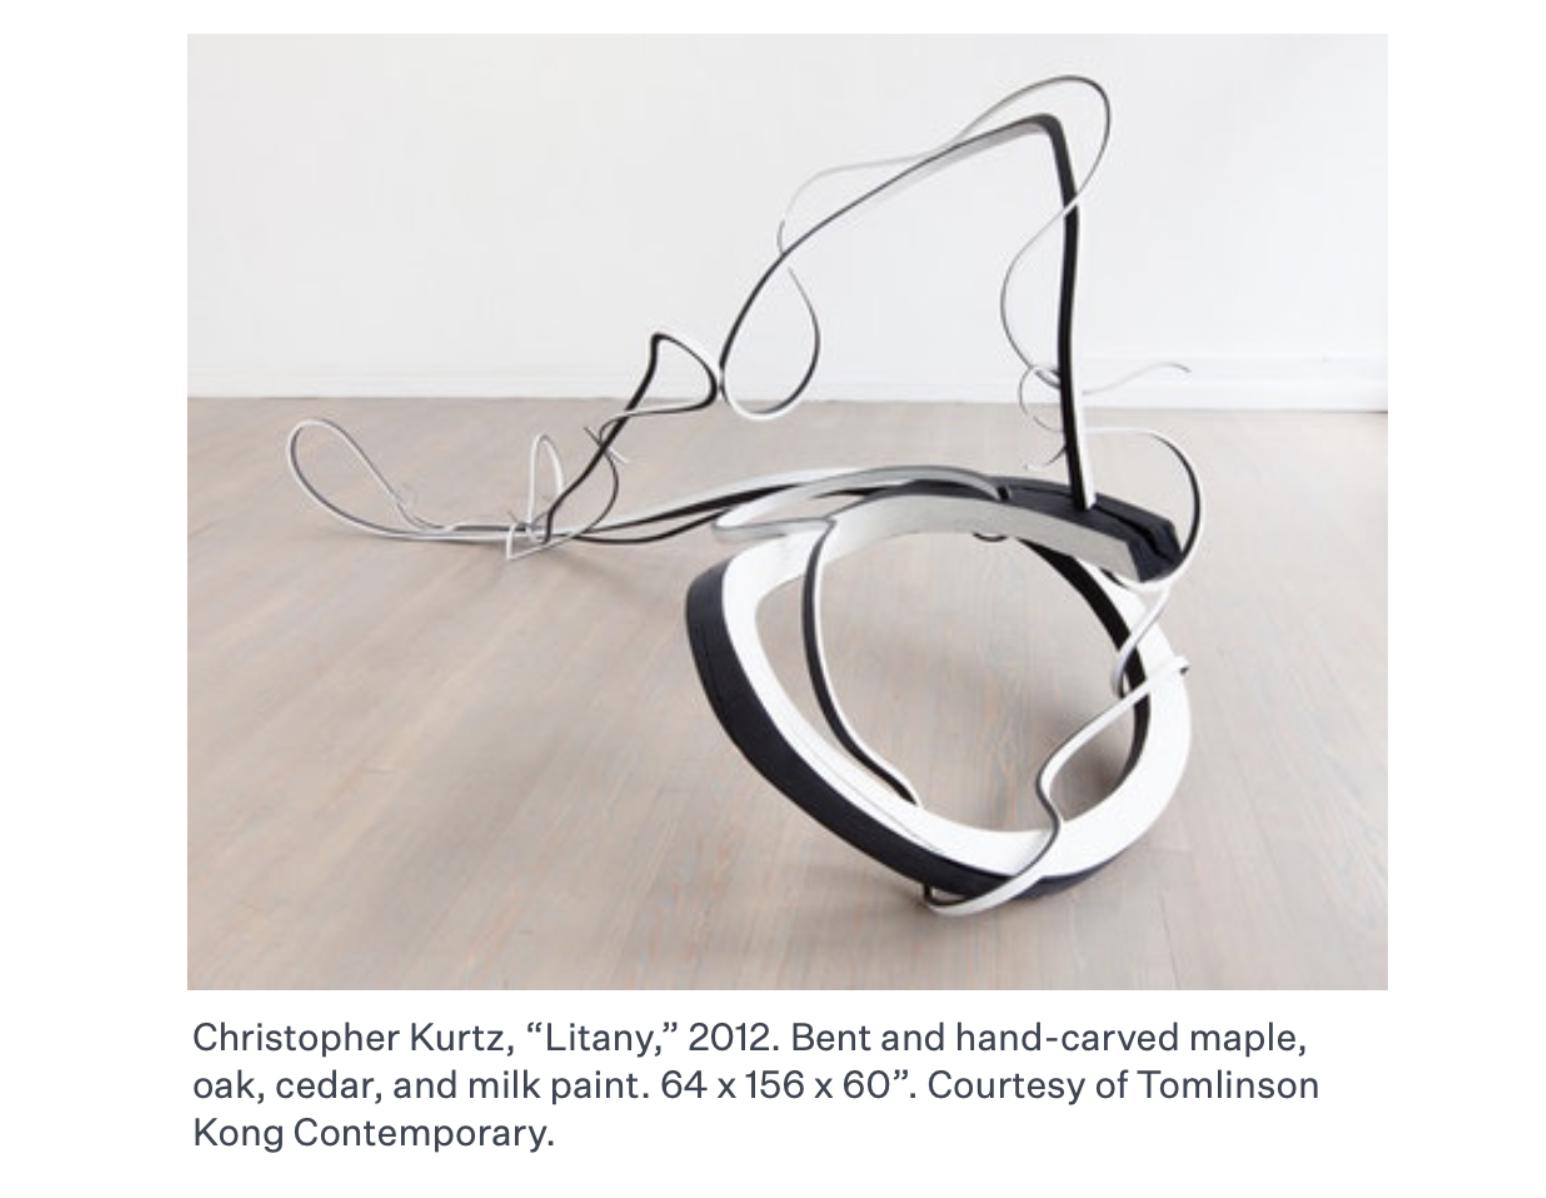 Litany is a free-form sculpture by artist Christopher Kurtz